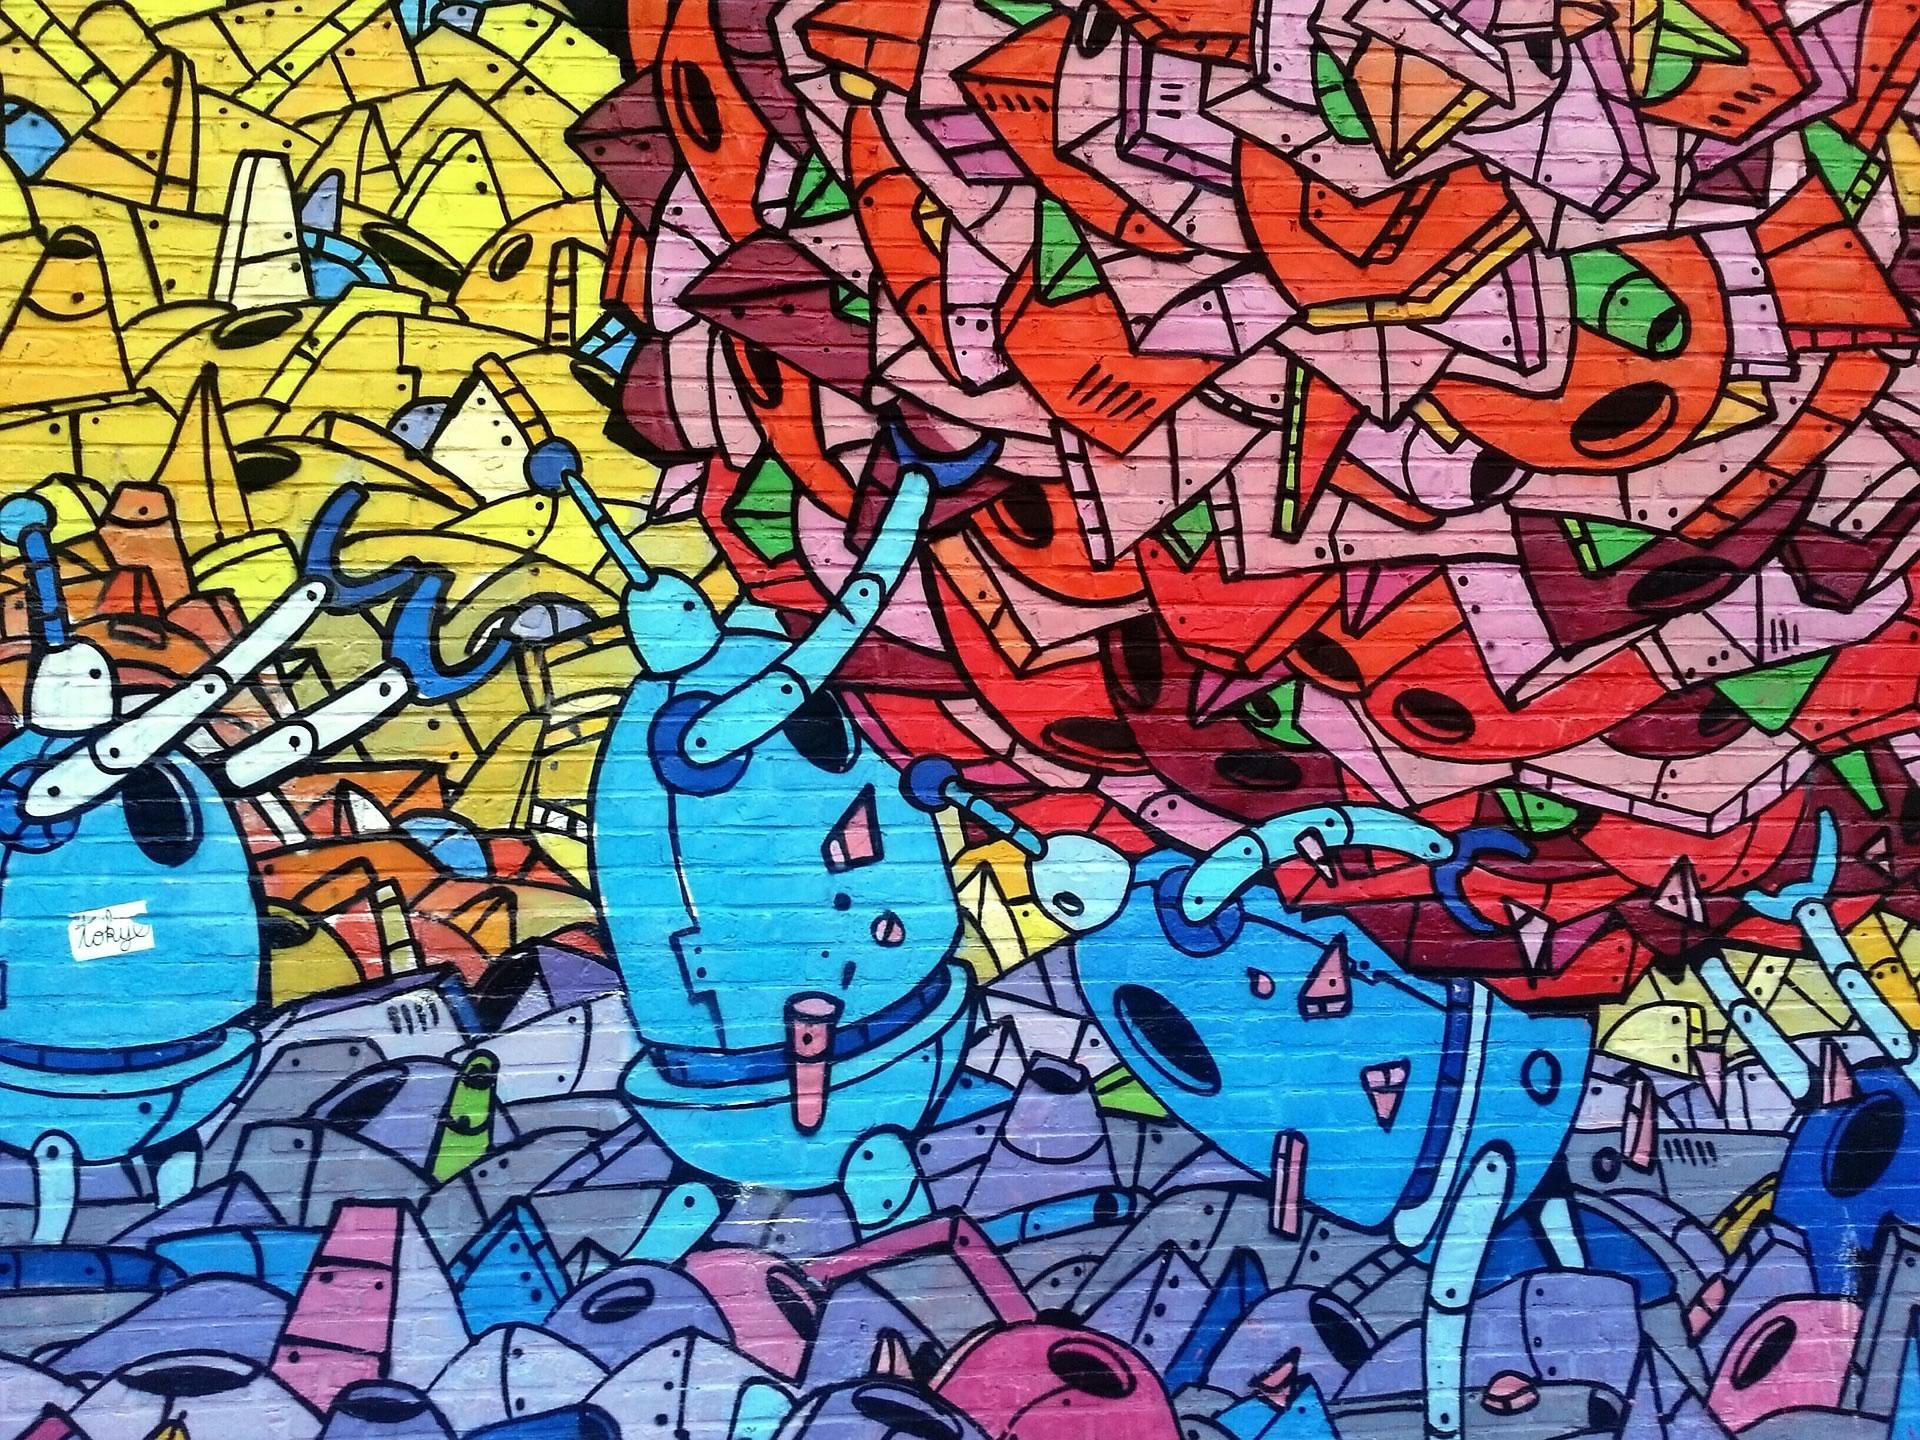 download wallpaper-graffitti-robots wallpaper